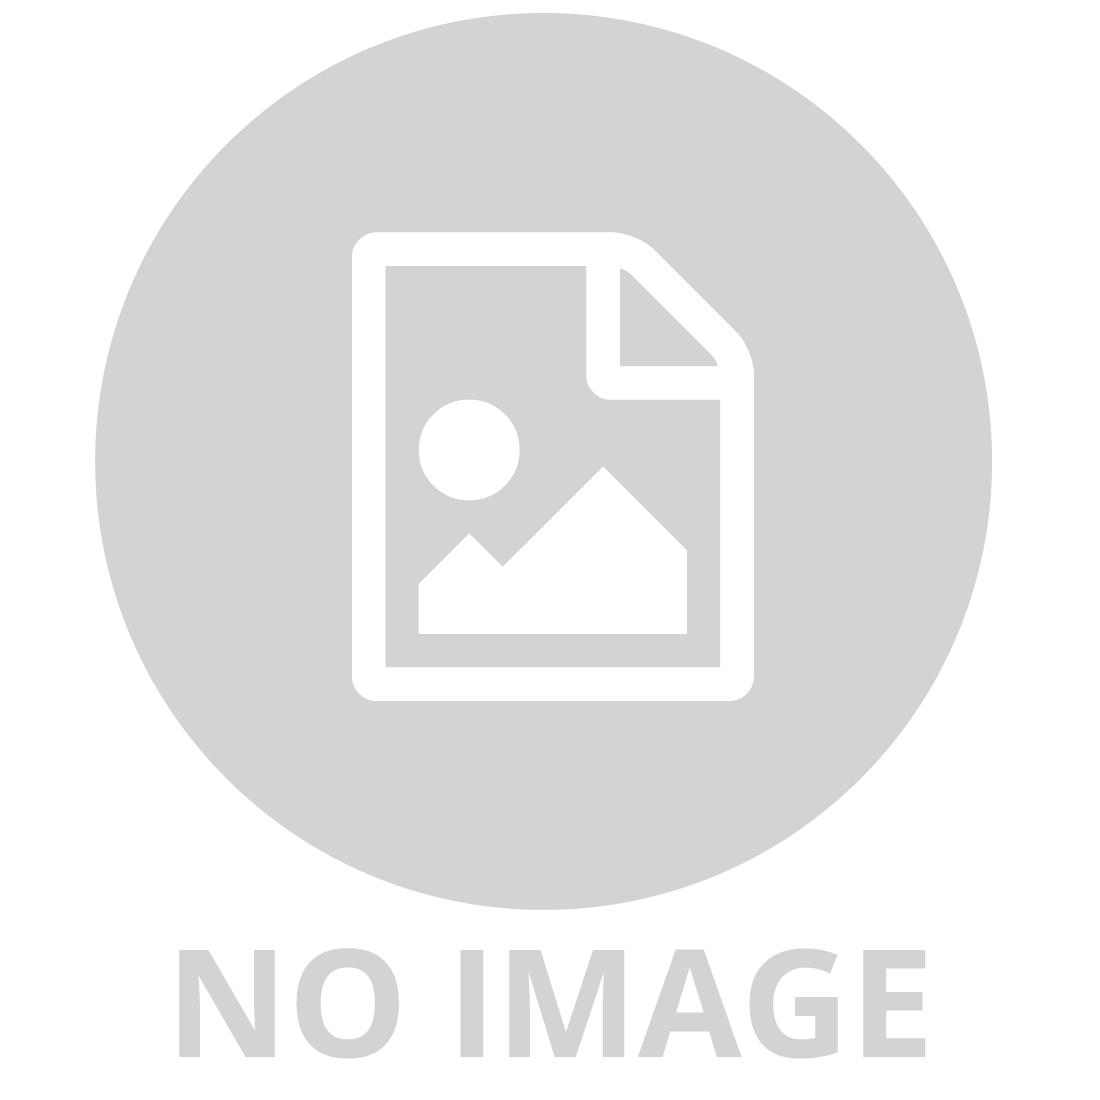 CREATIVE KIDS SCIENCE 2.0 TURBO AIR SCIENCE